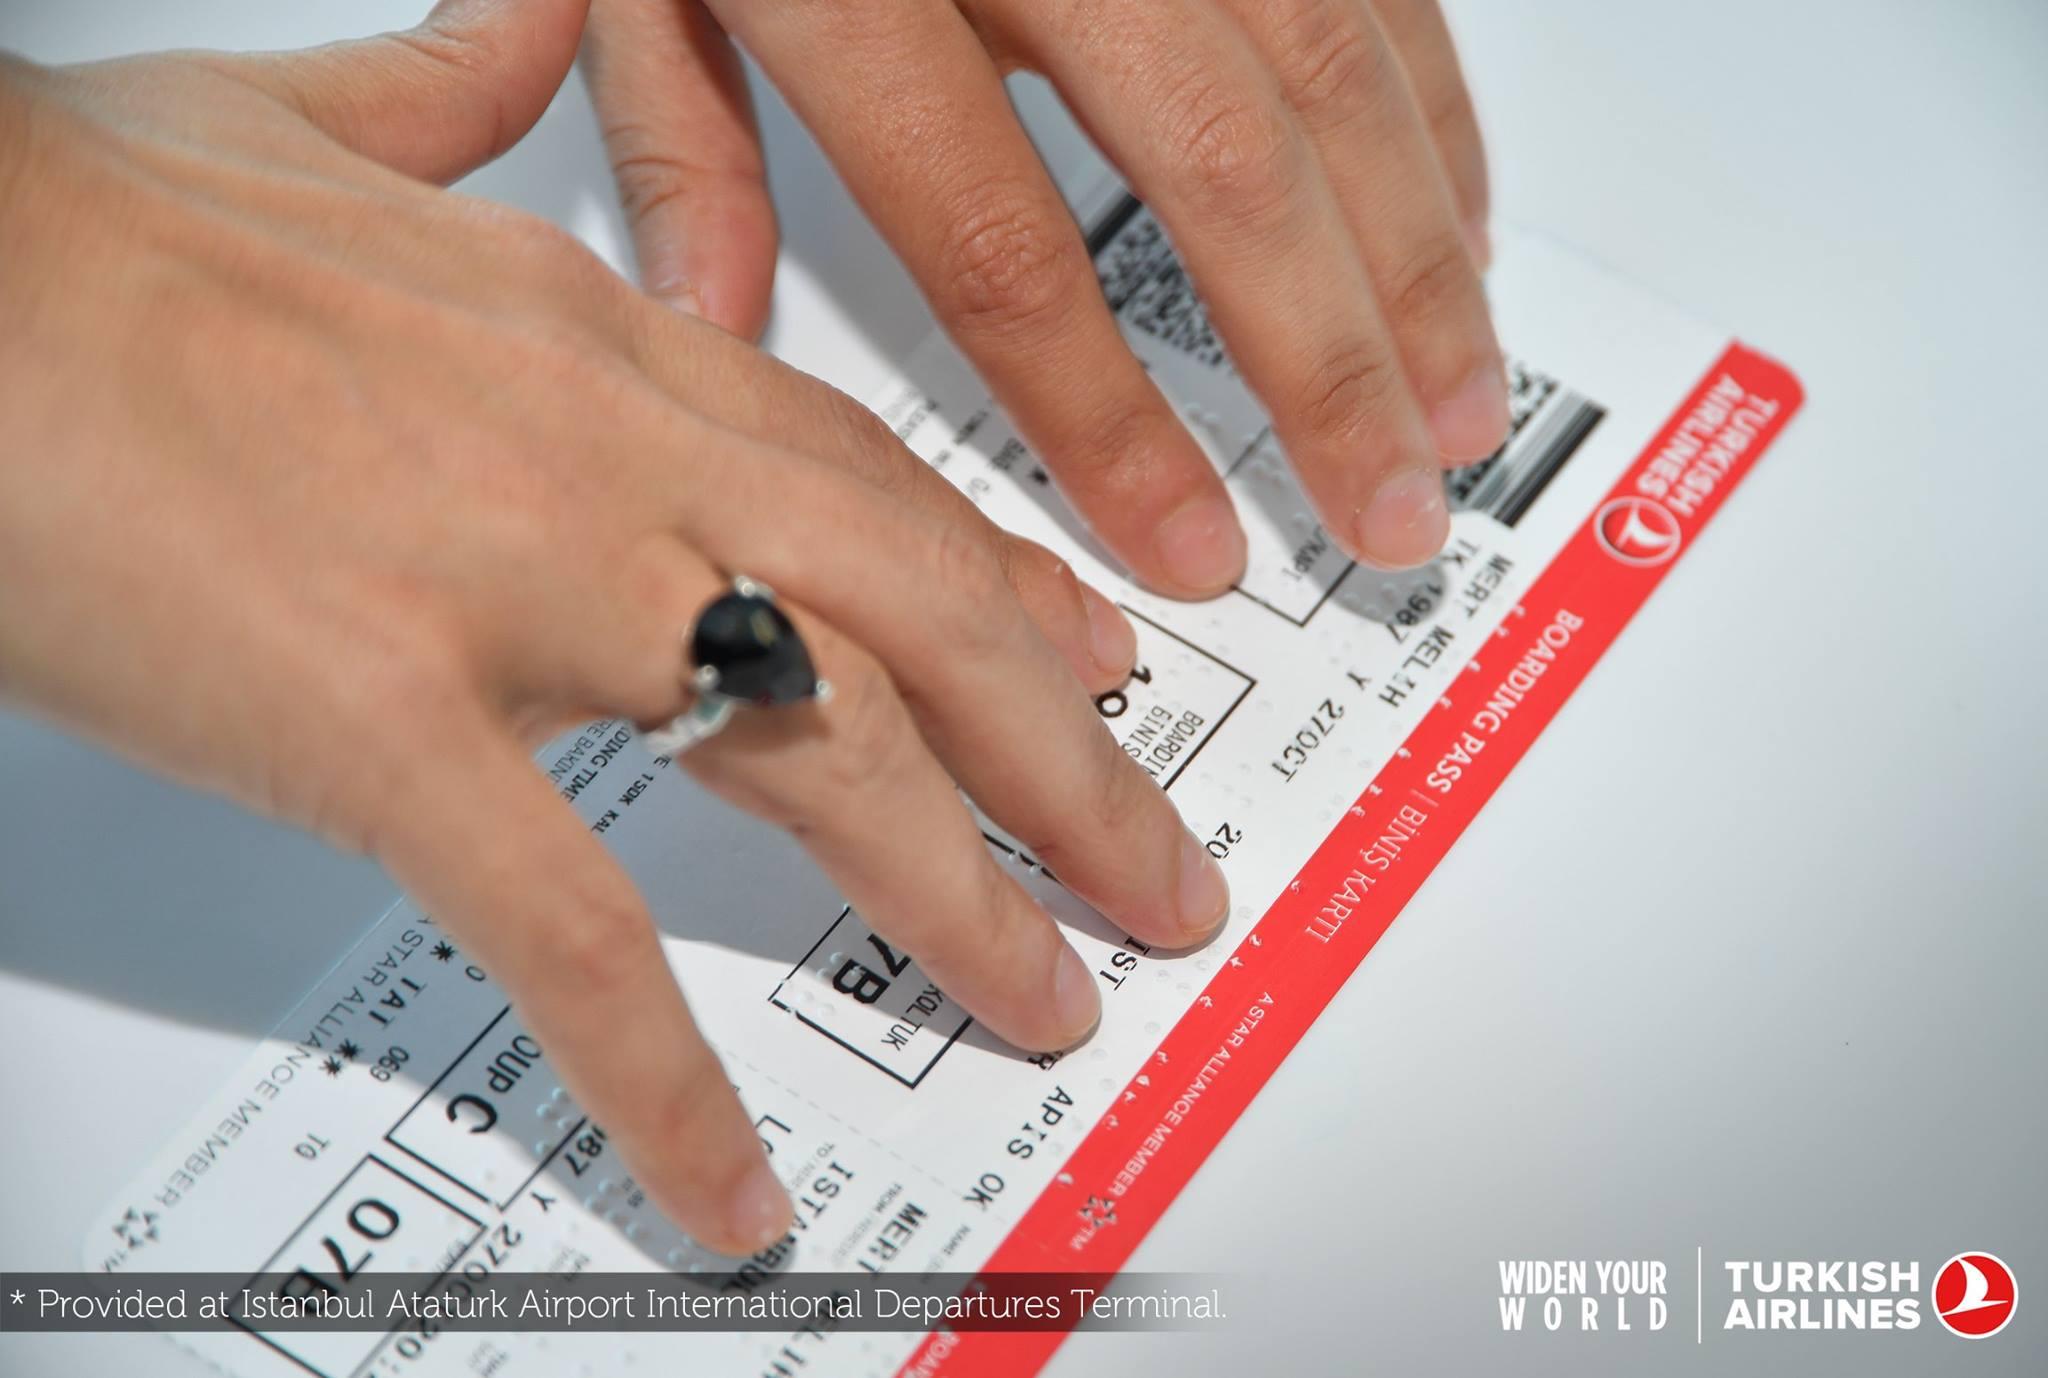 Boarding Pass in Braille